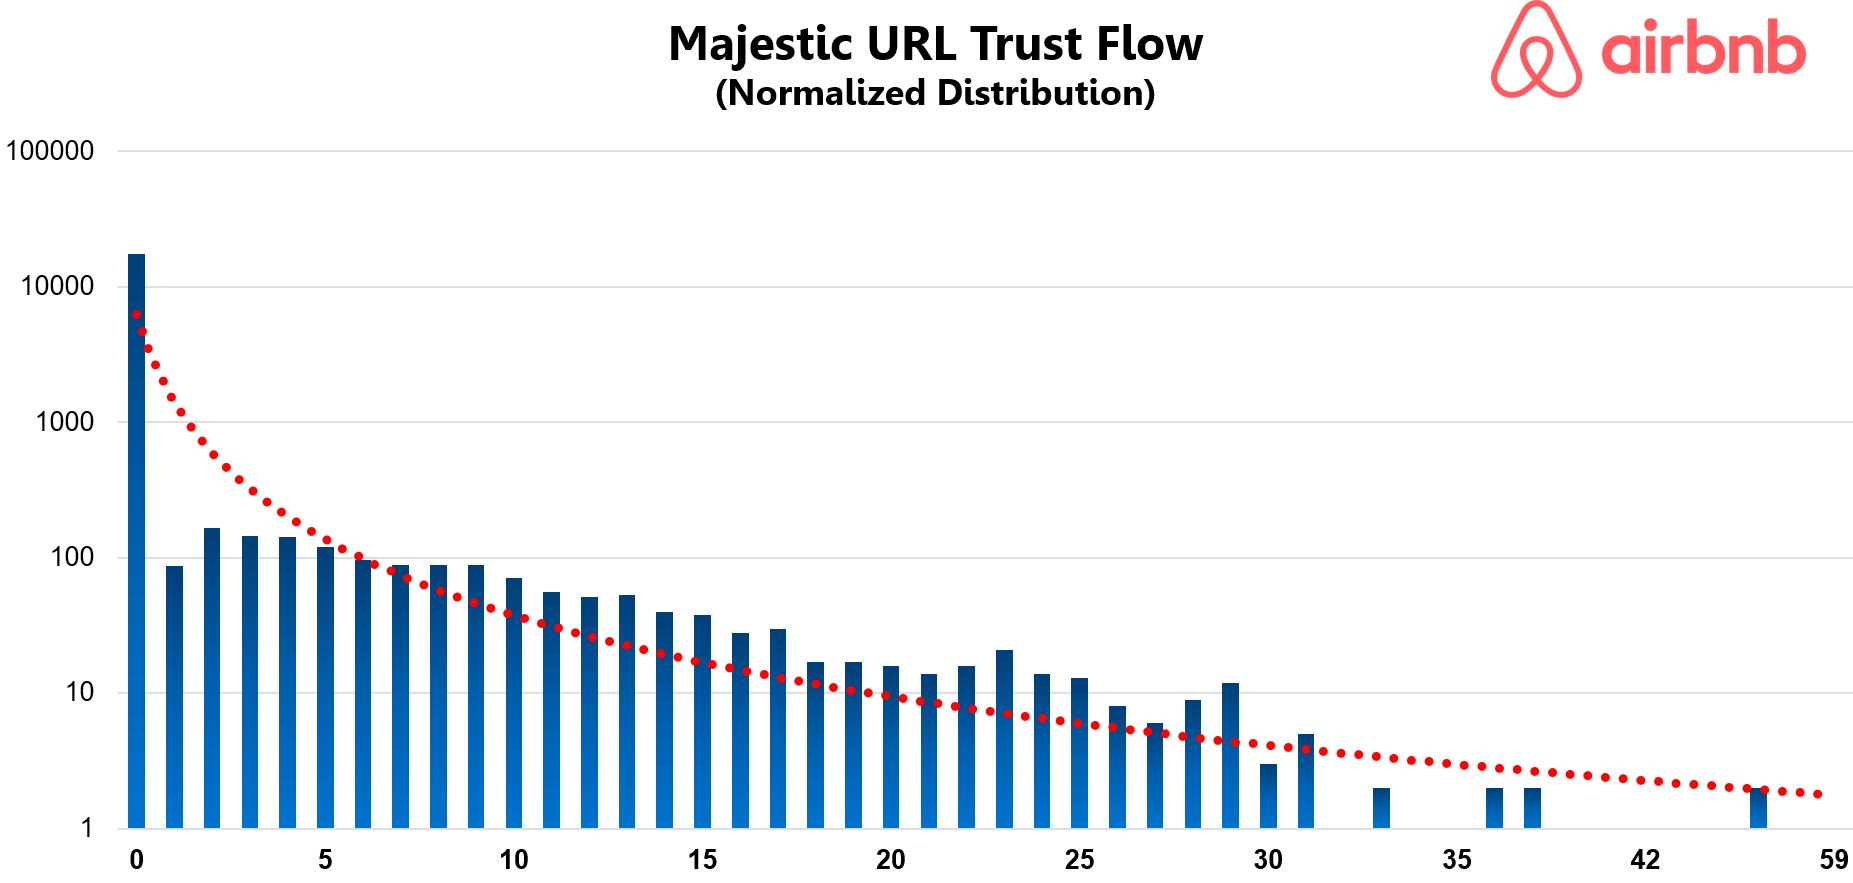 Airbnb Majestic URL Trust Flow